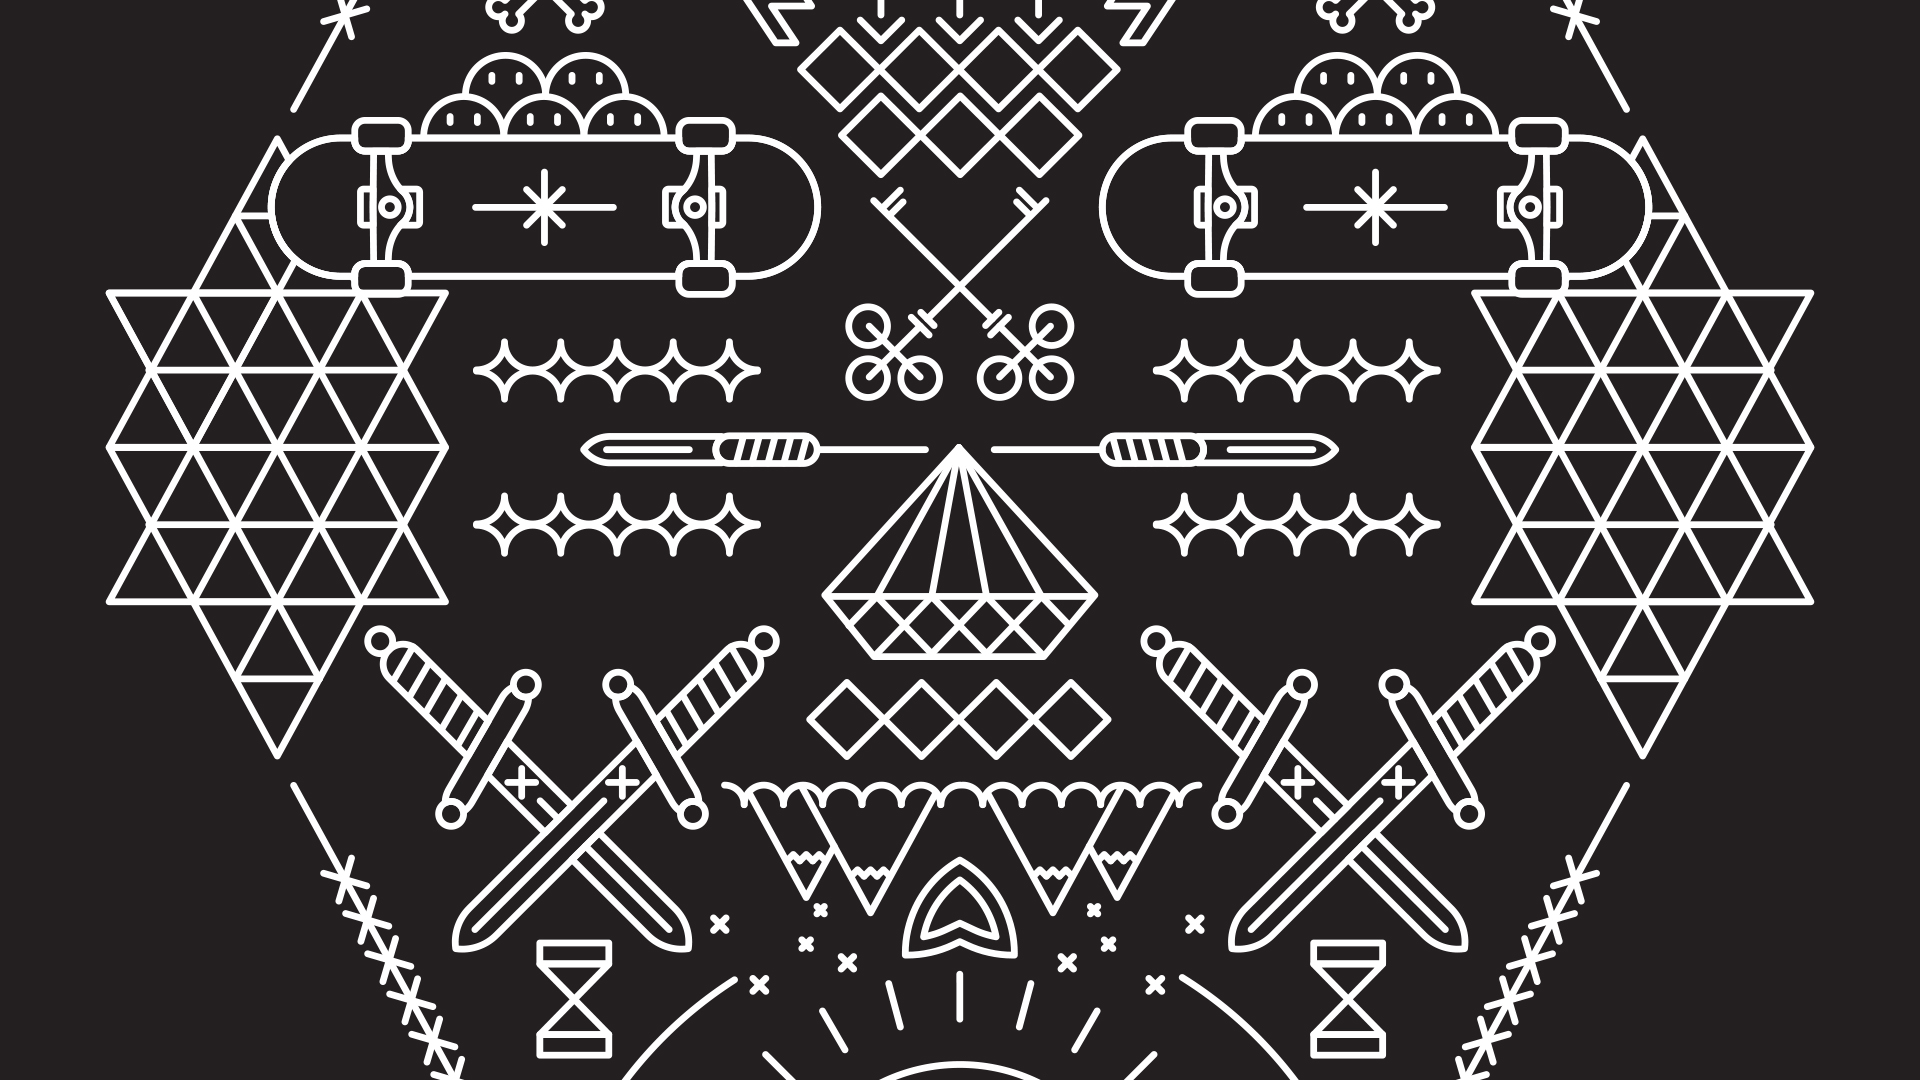 Simetria_07